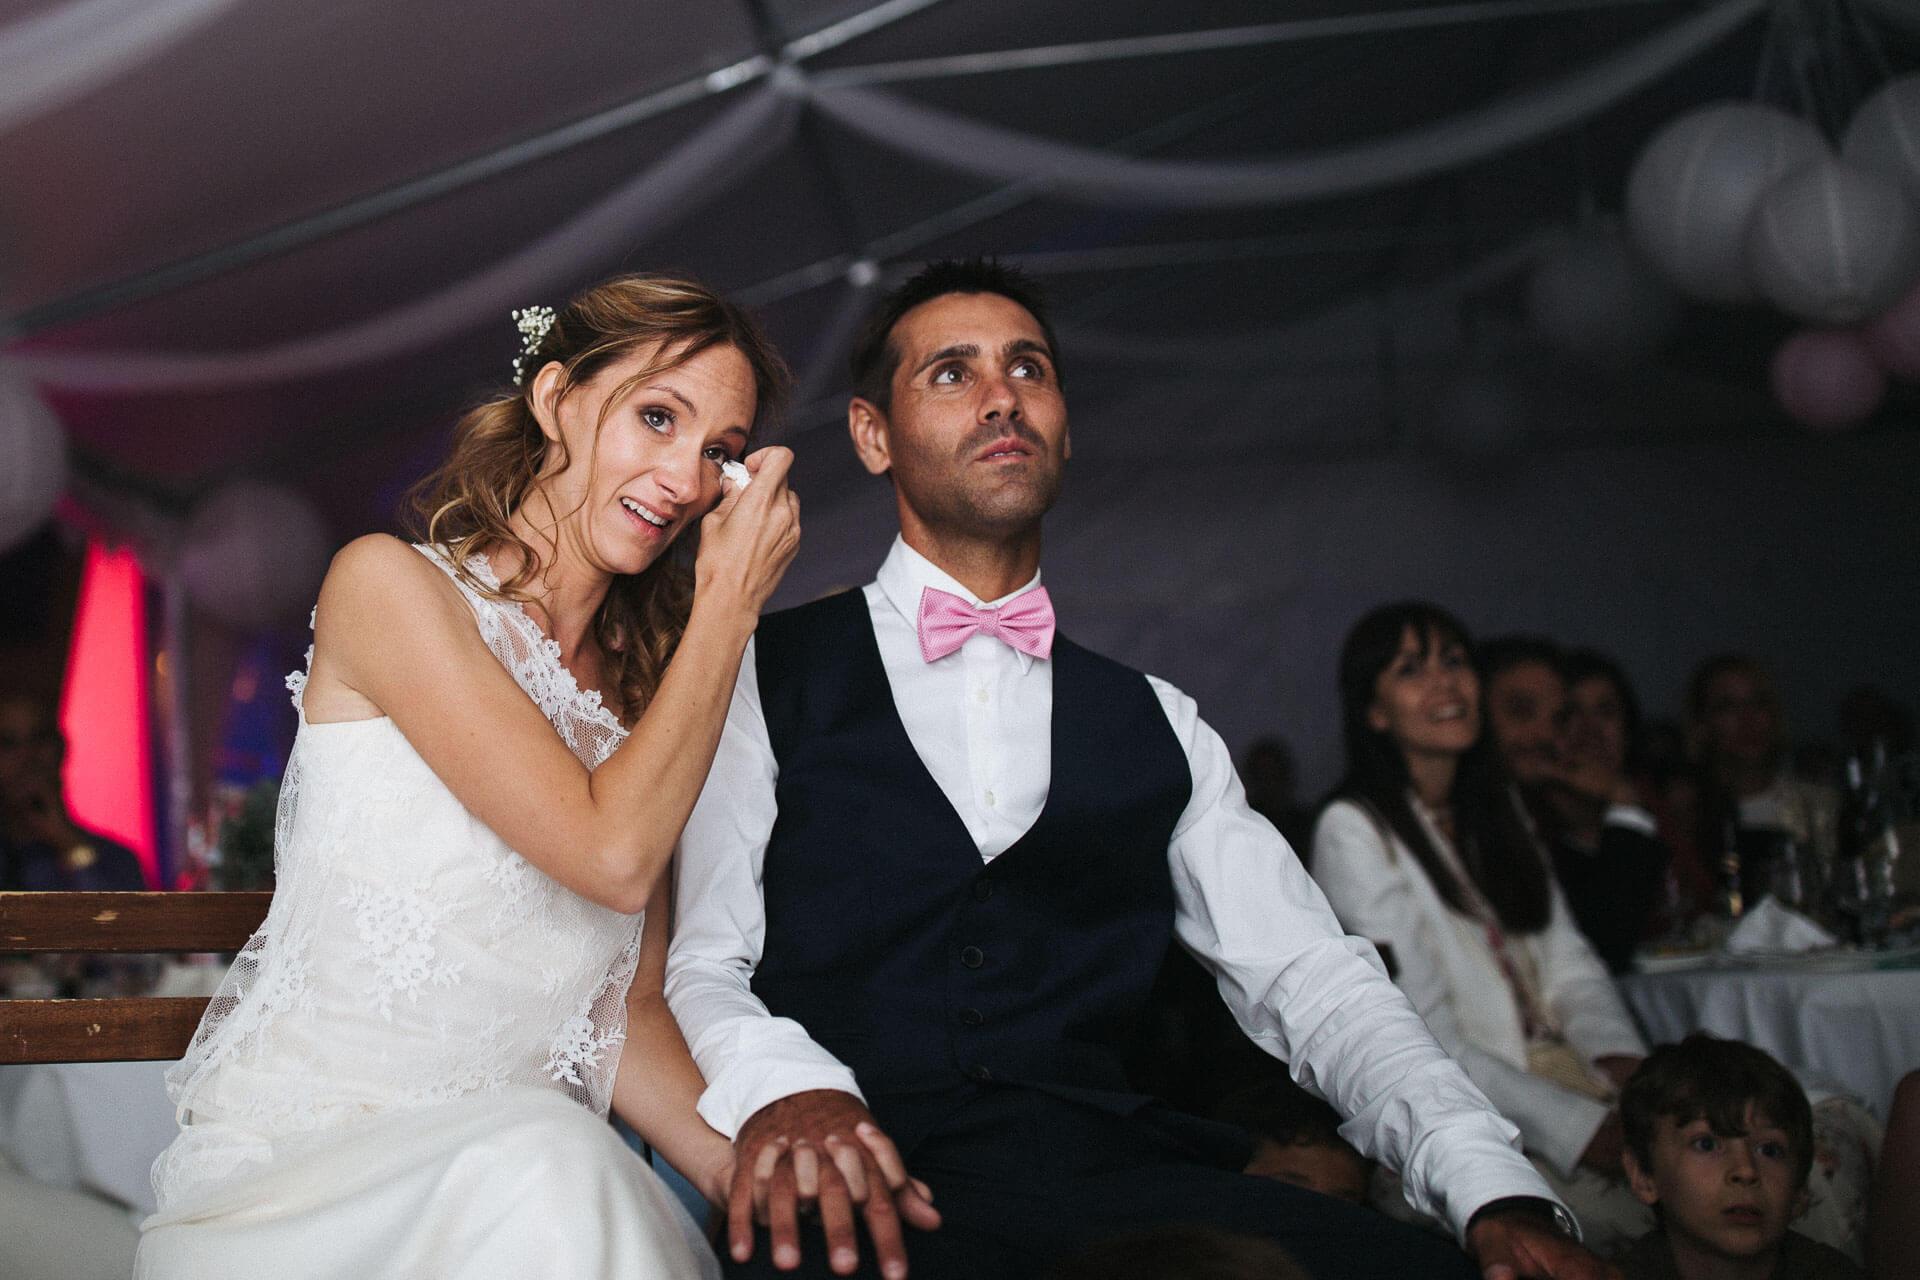 photographe-mariage-aix-en-provence-stephanie-jerome-35